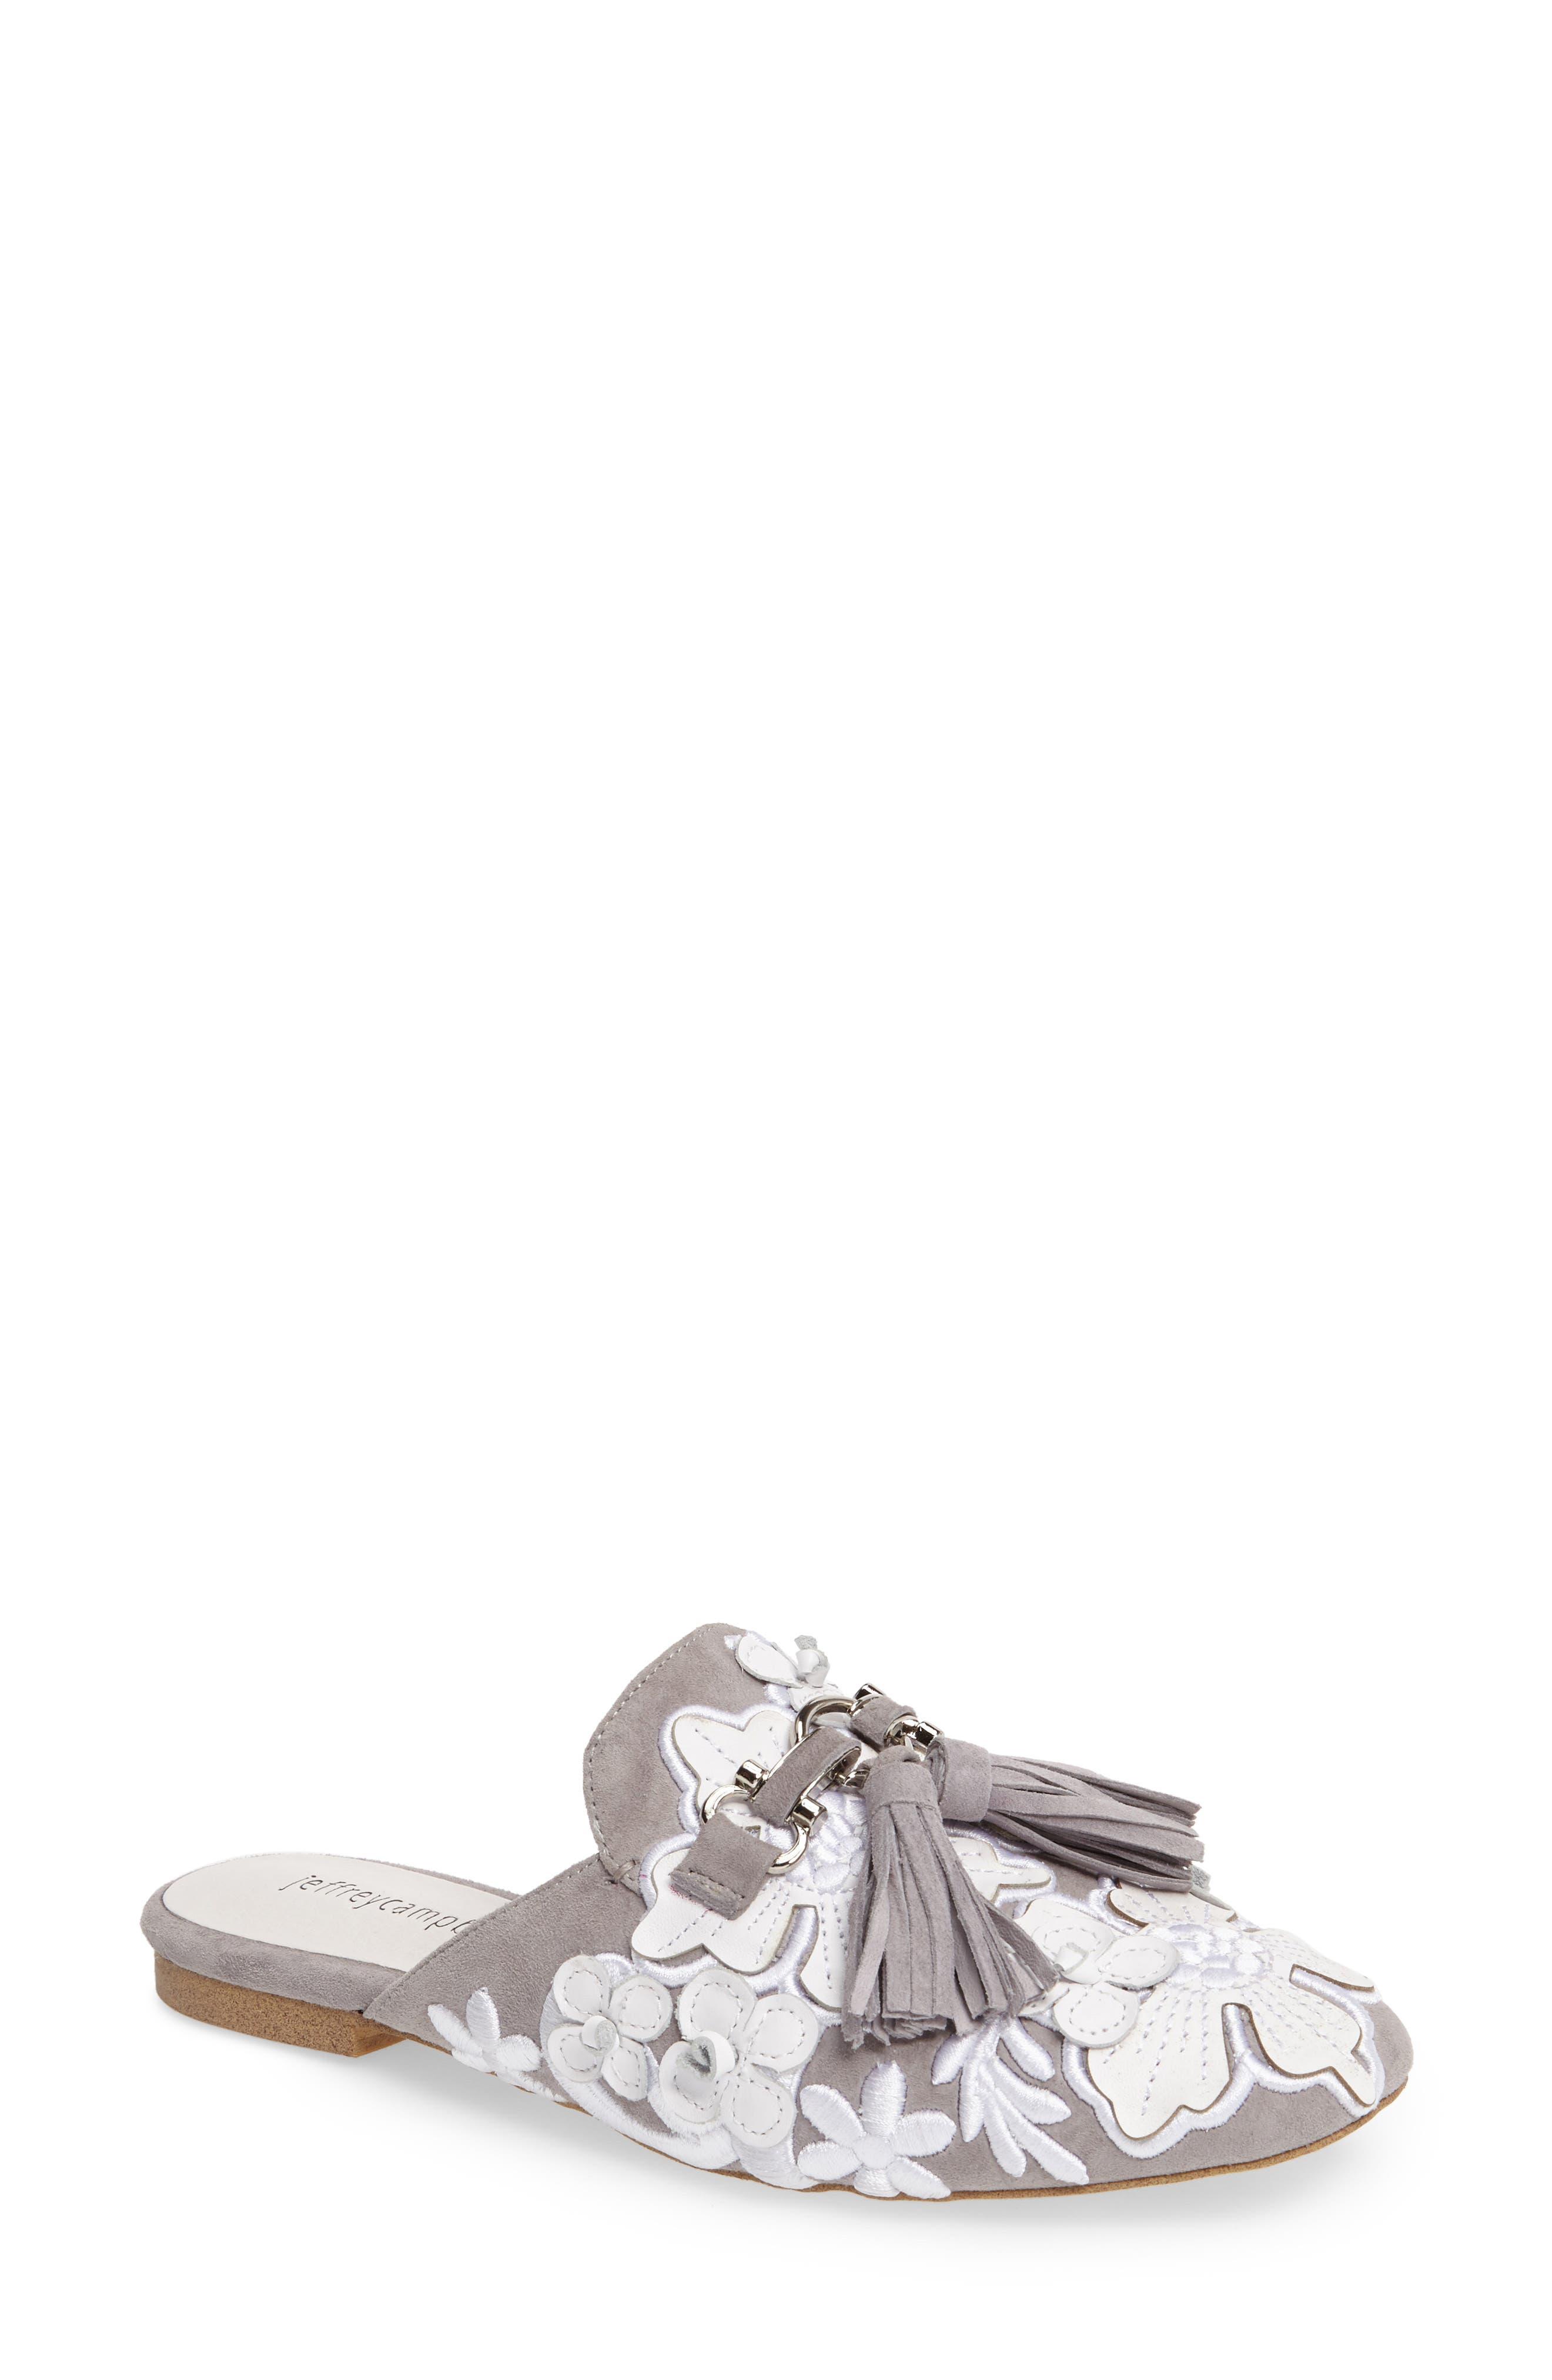 Main Image - Jeffrey Campbell Ravis Flowered Loafer Mule (Women)